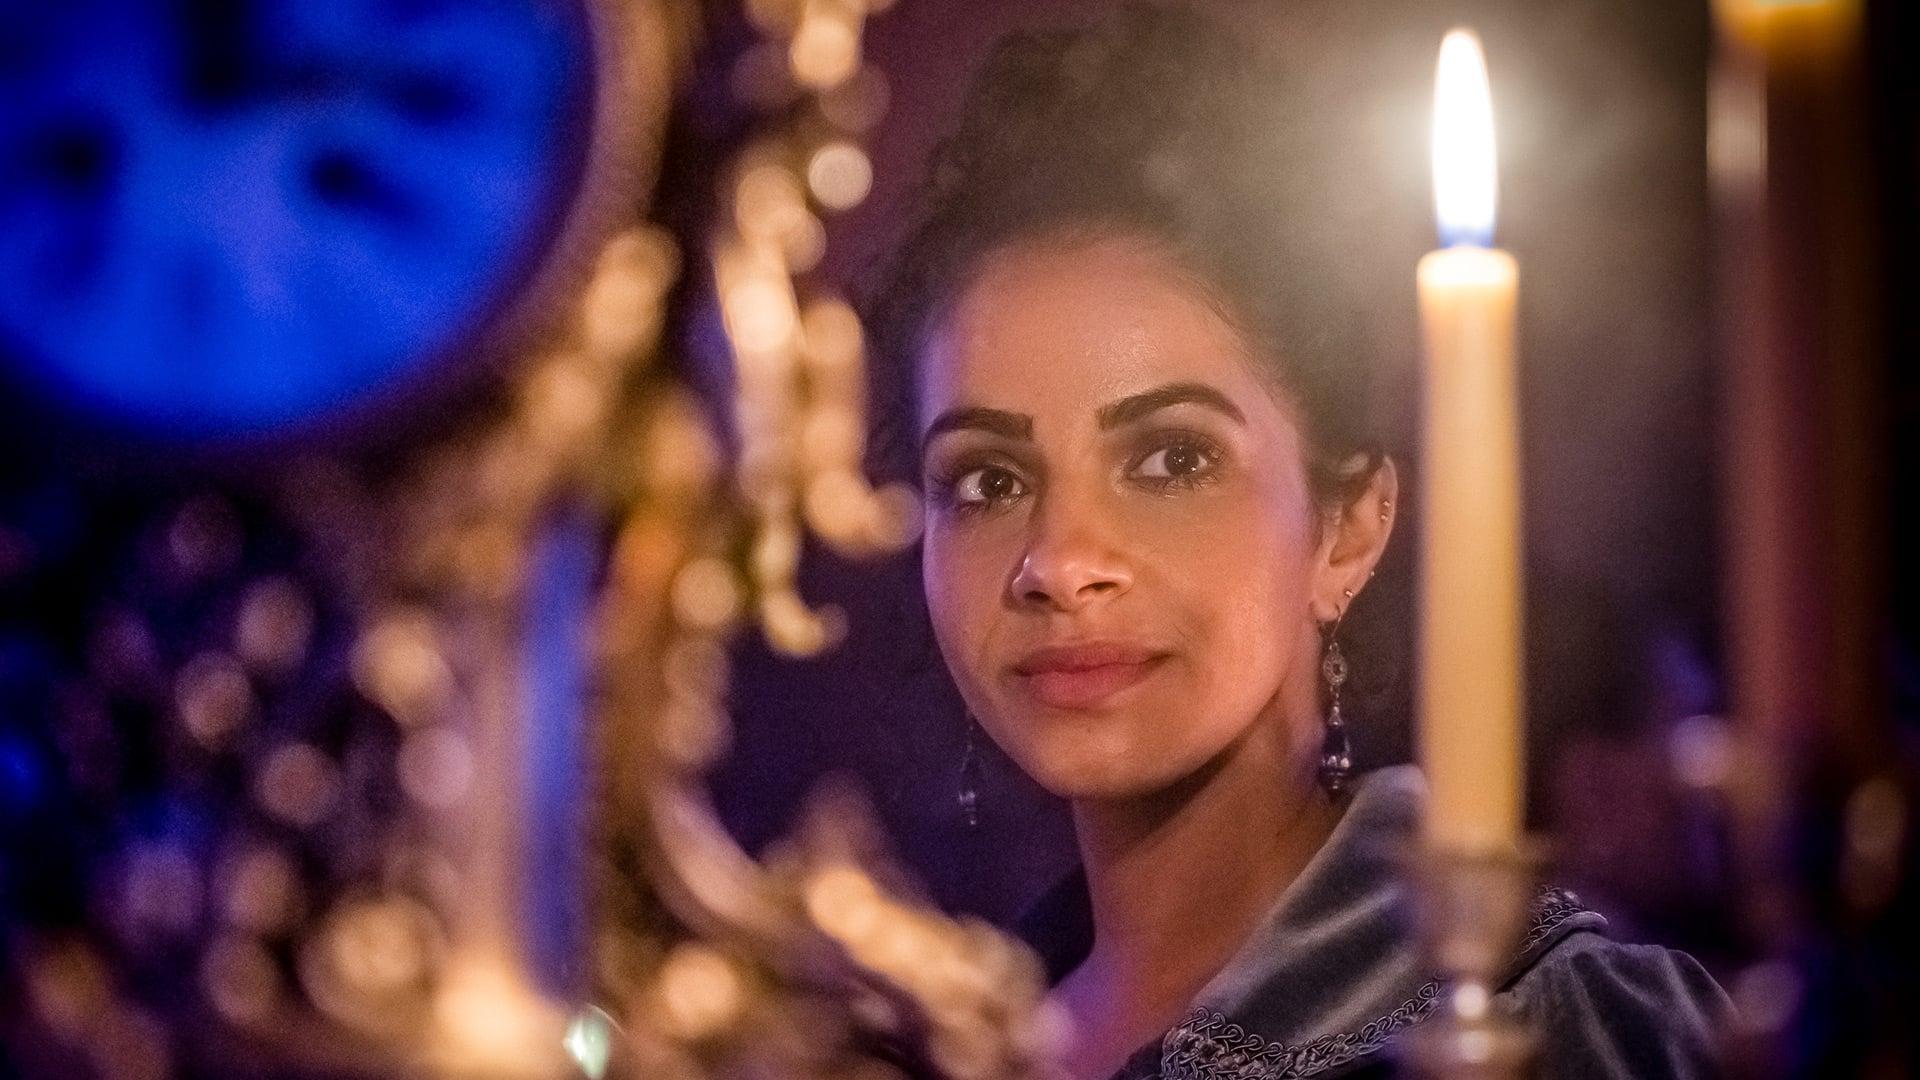 Doctor Who - Season 12 Episode 8 : The Haunting of Villa Diodati